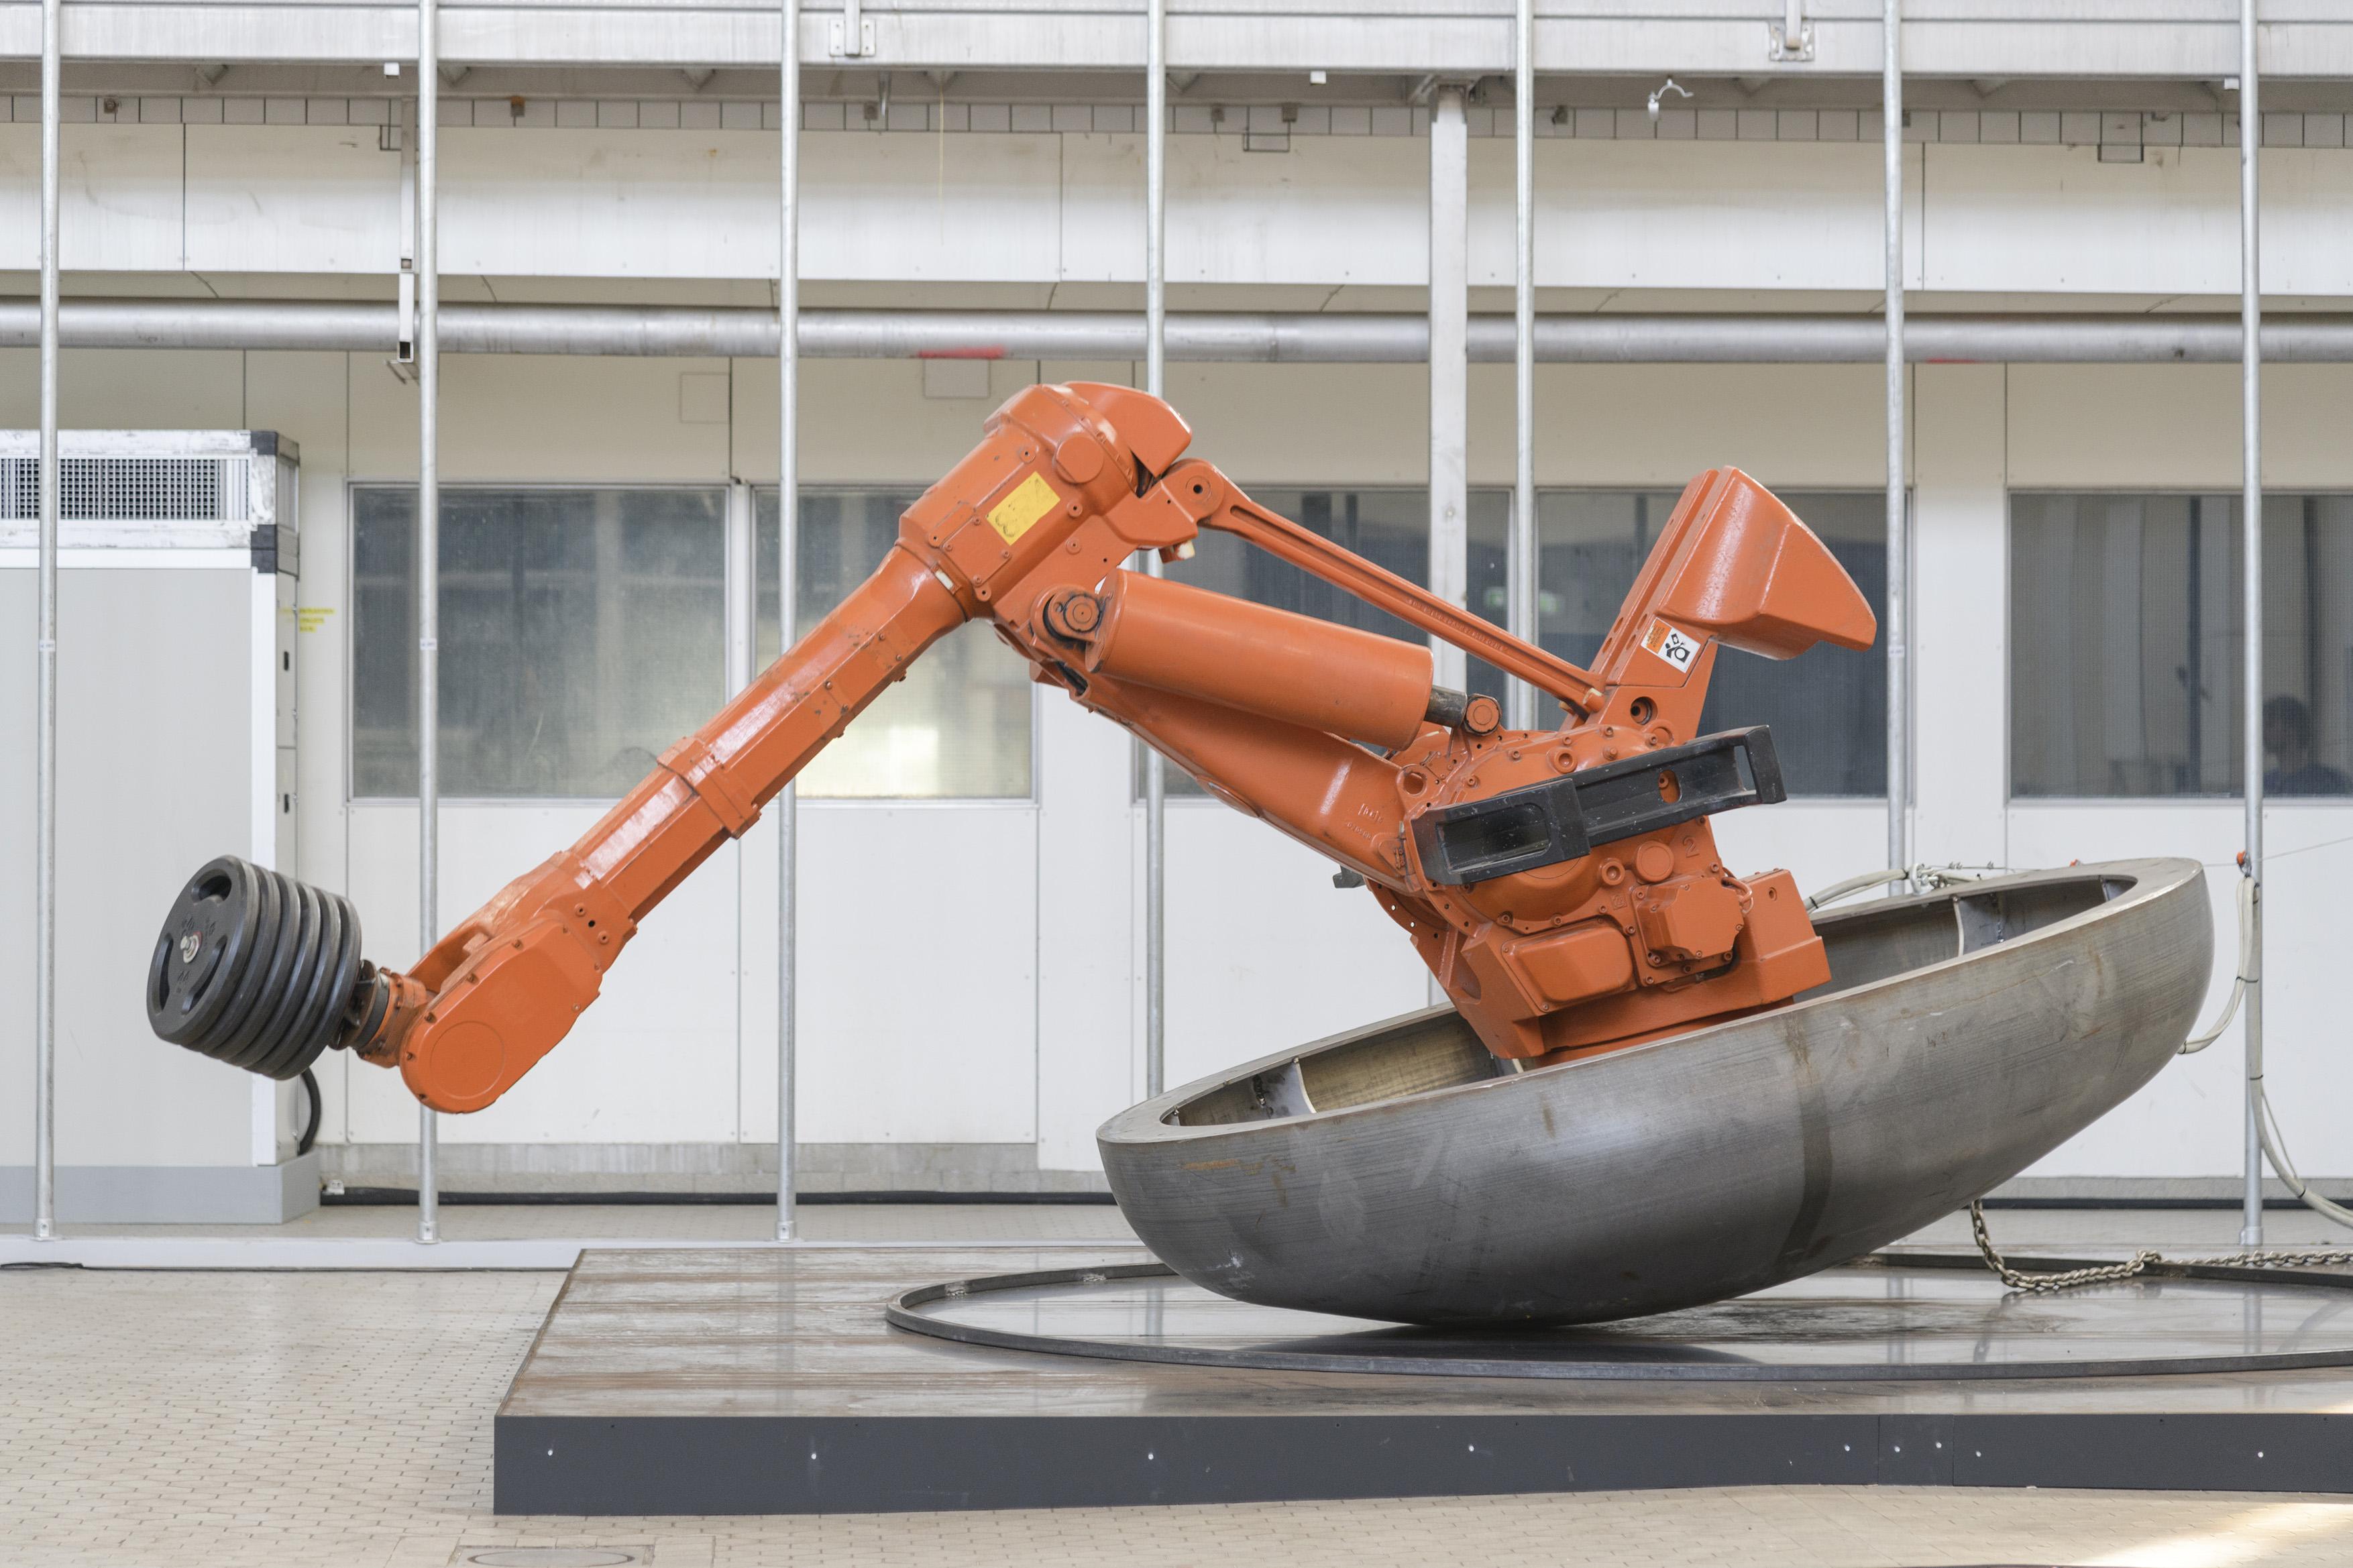 3 Zoro Feigl – Robot Love 3 copy